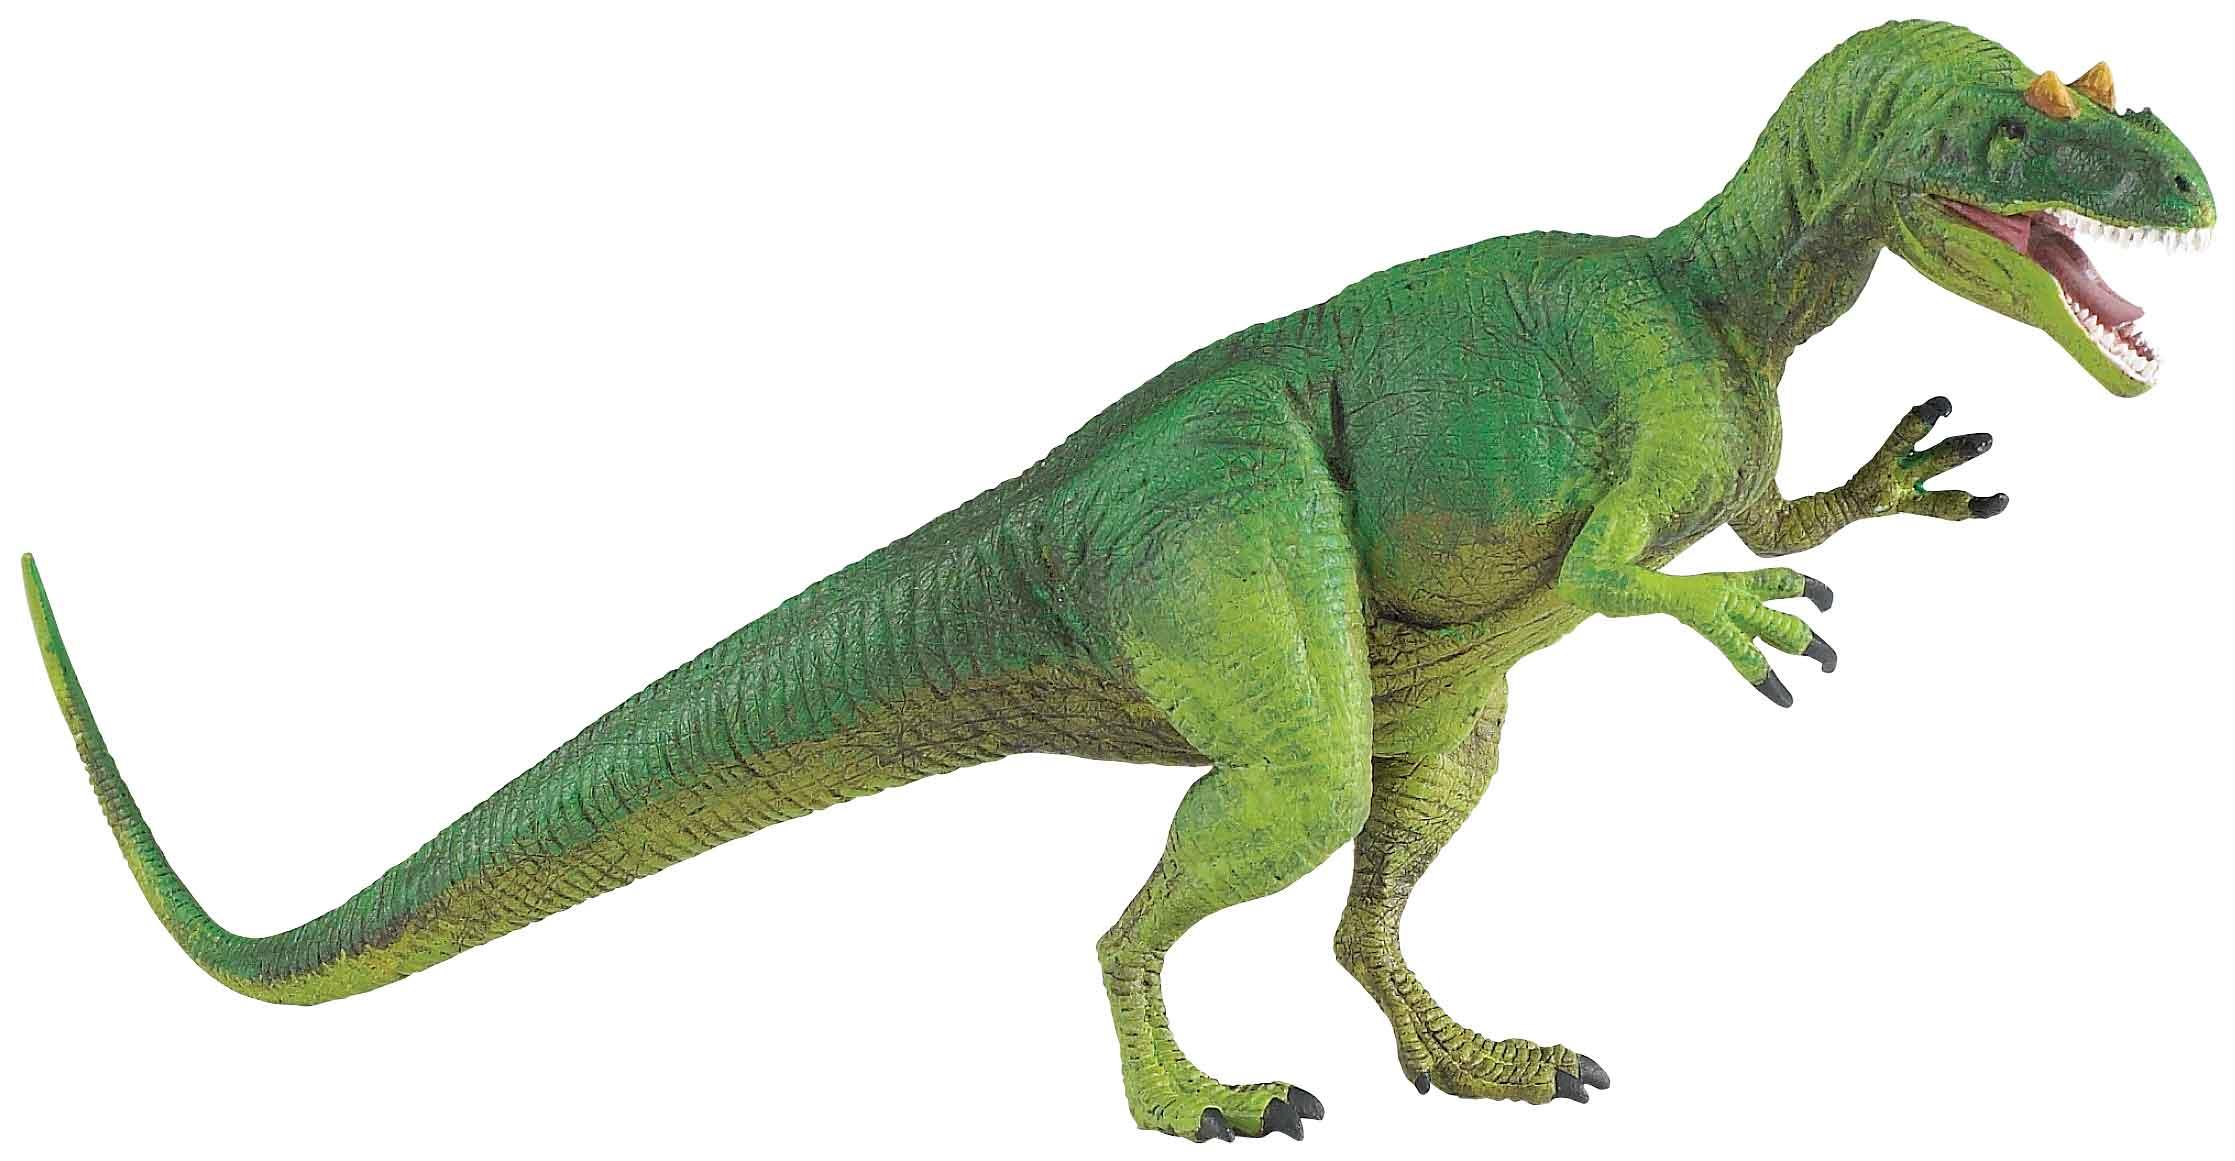 dinosaur train avisaurus - photo #19